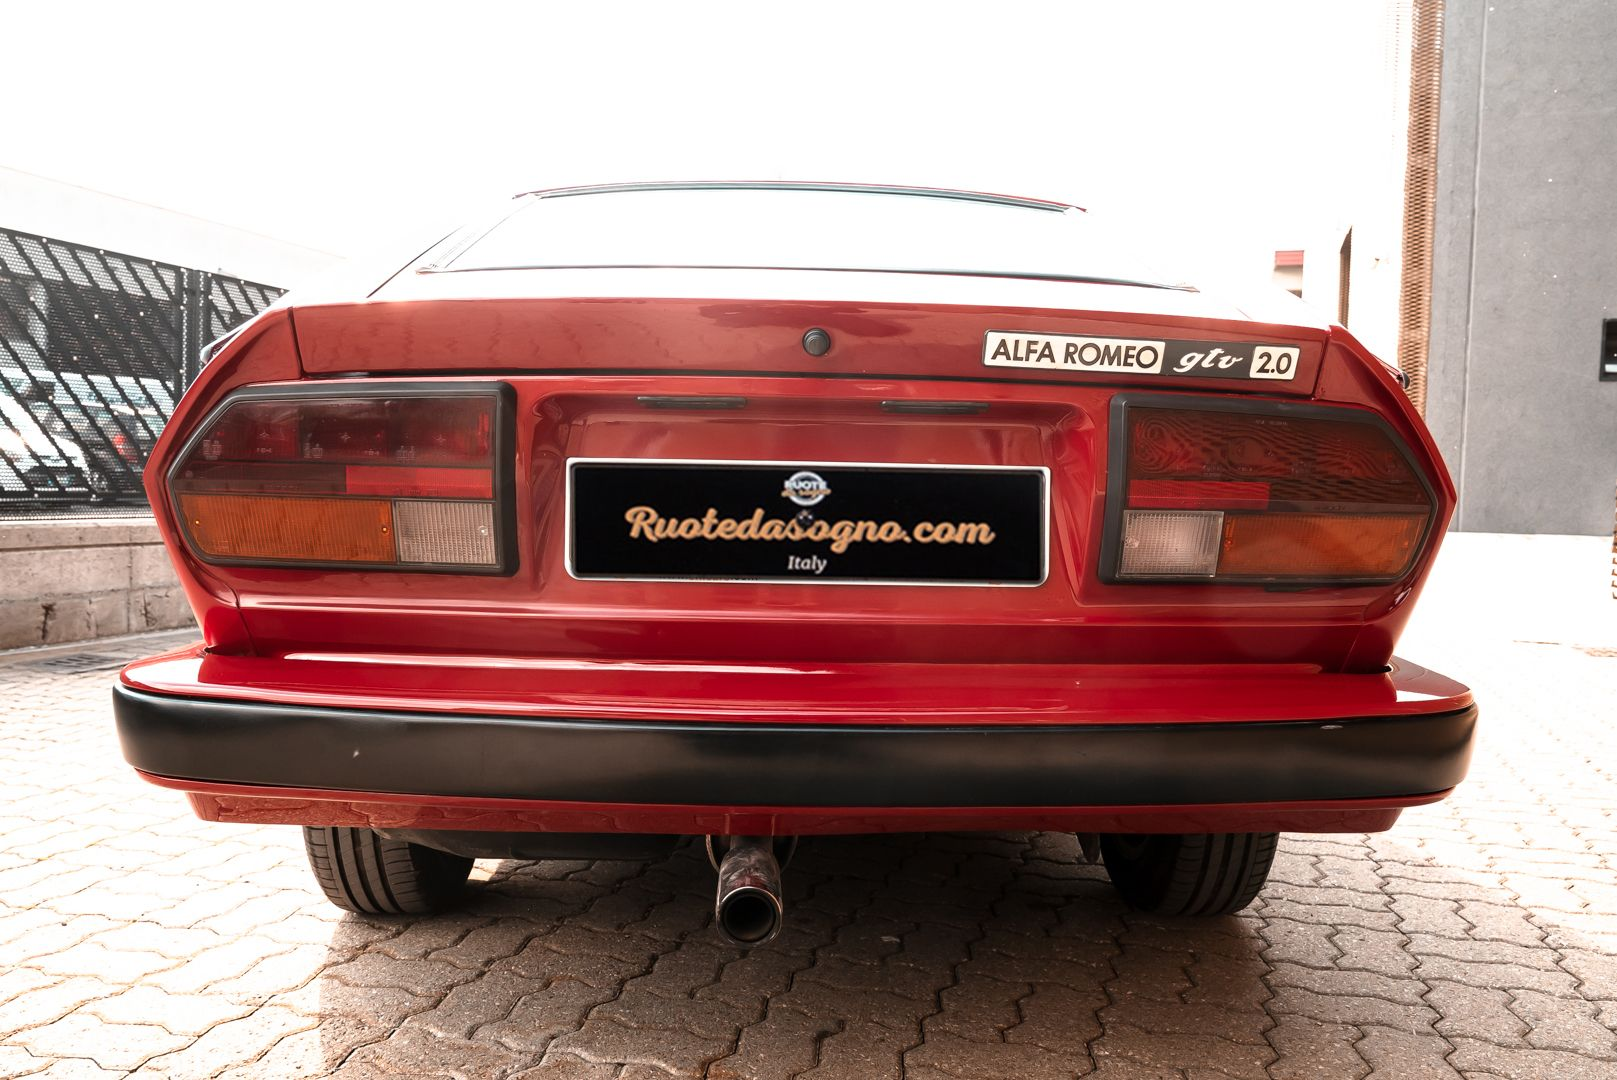 1981 Alfa Romeo Alfetta GTV Gran Prix n.128 68561